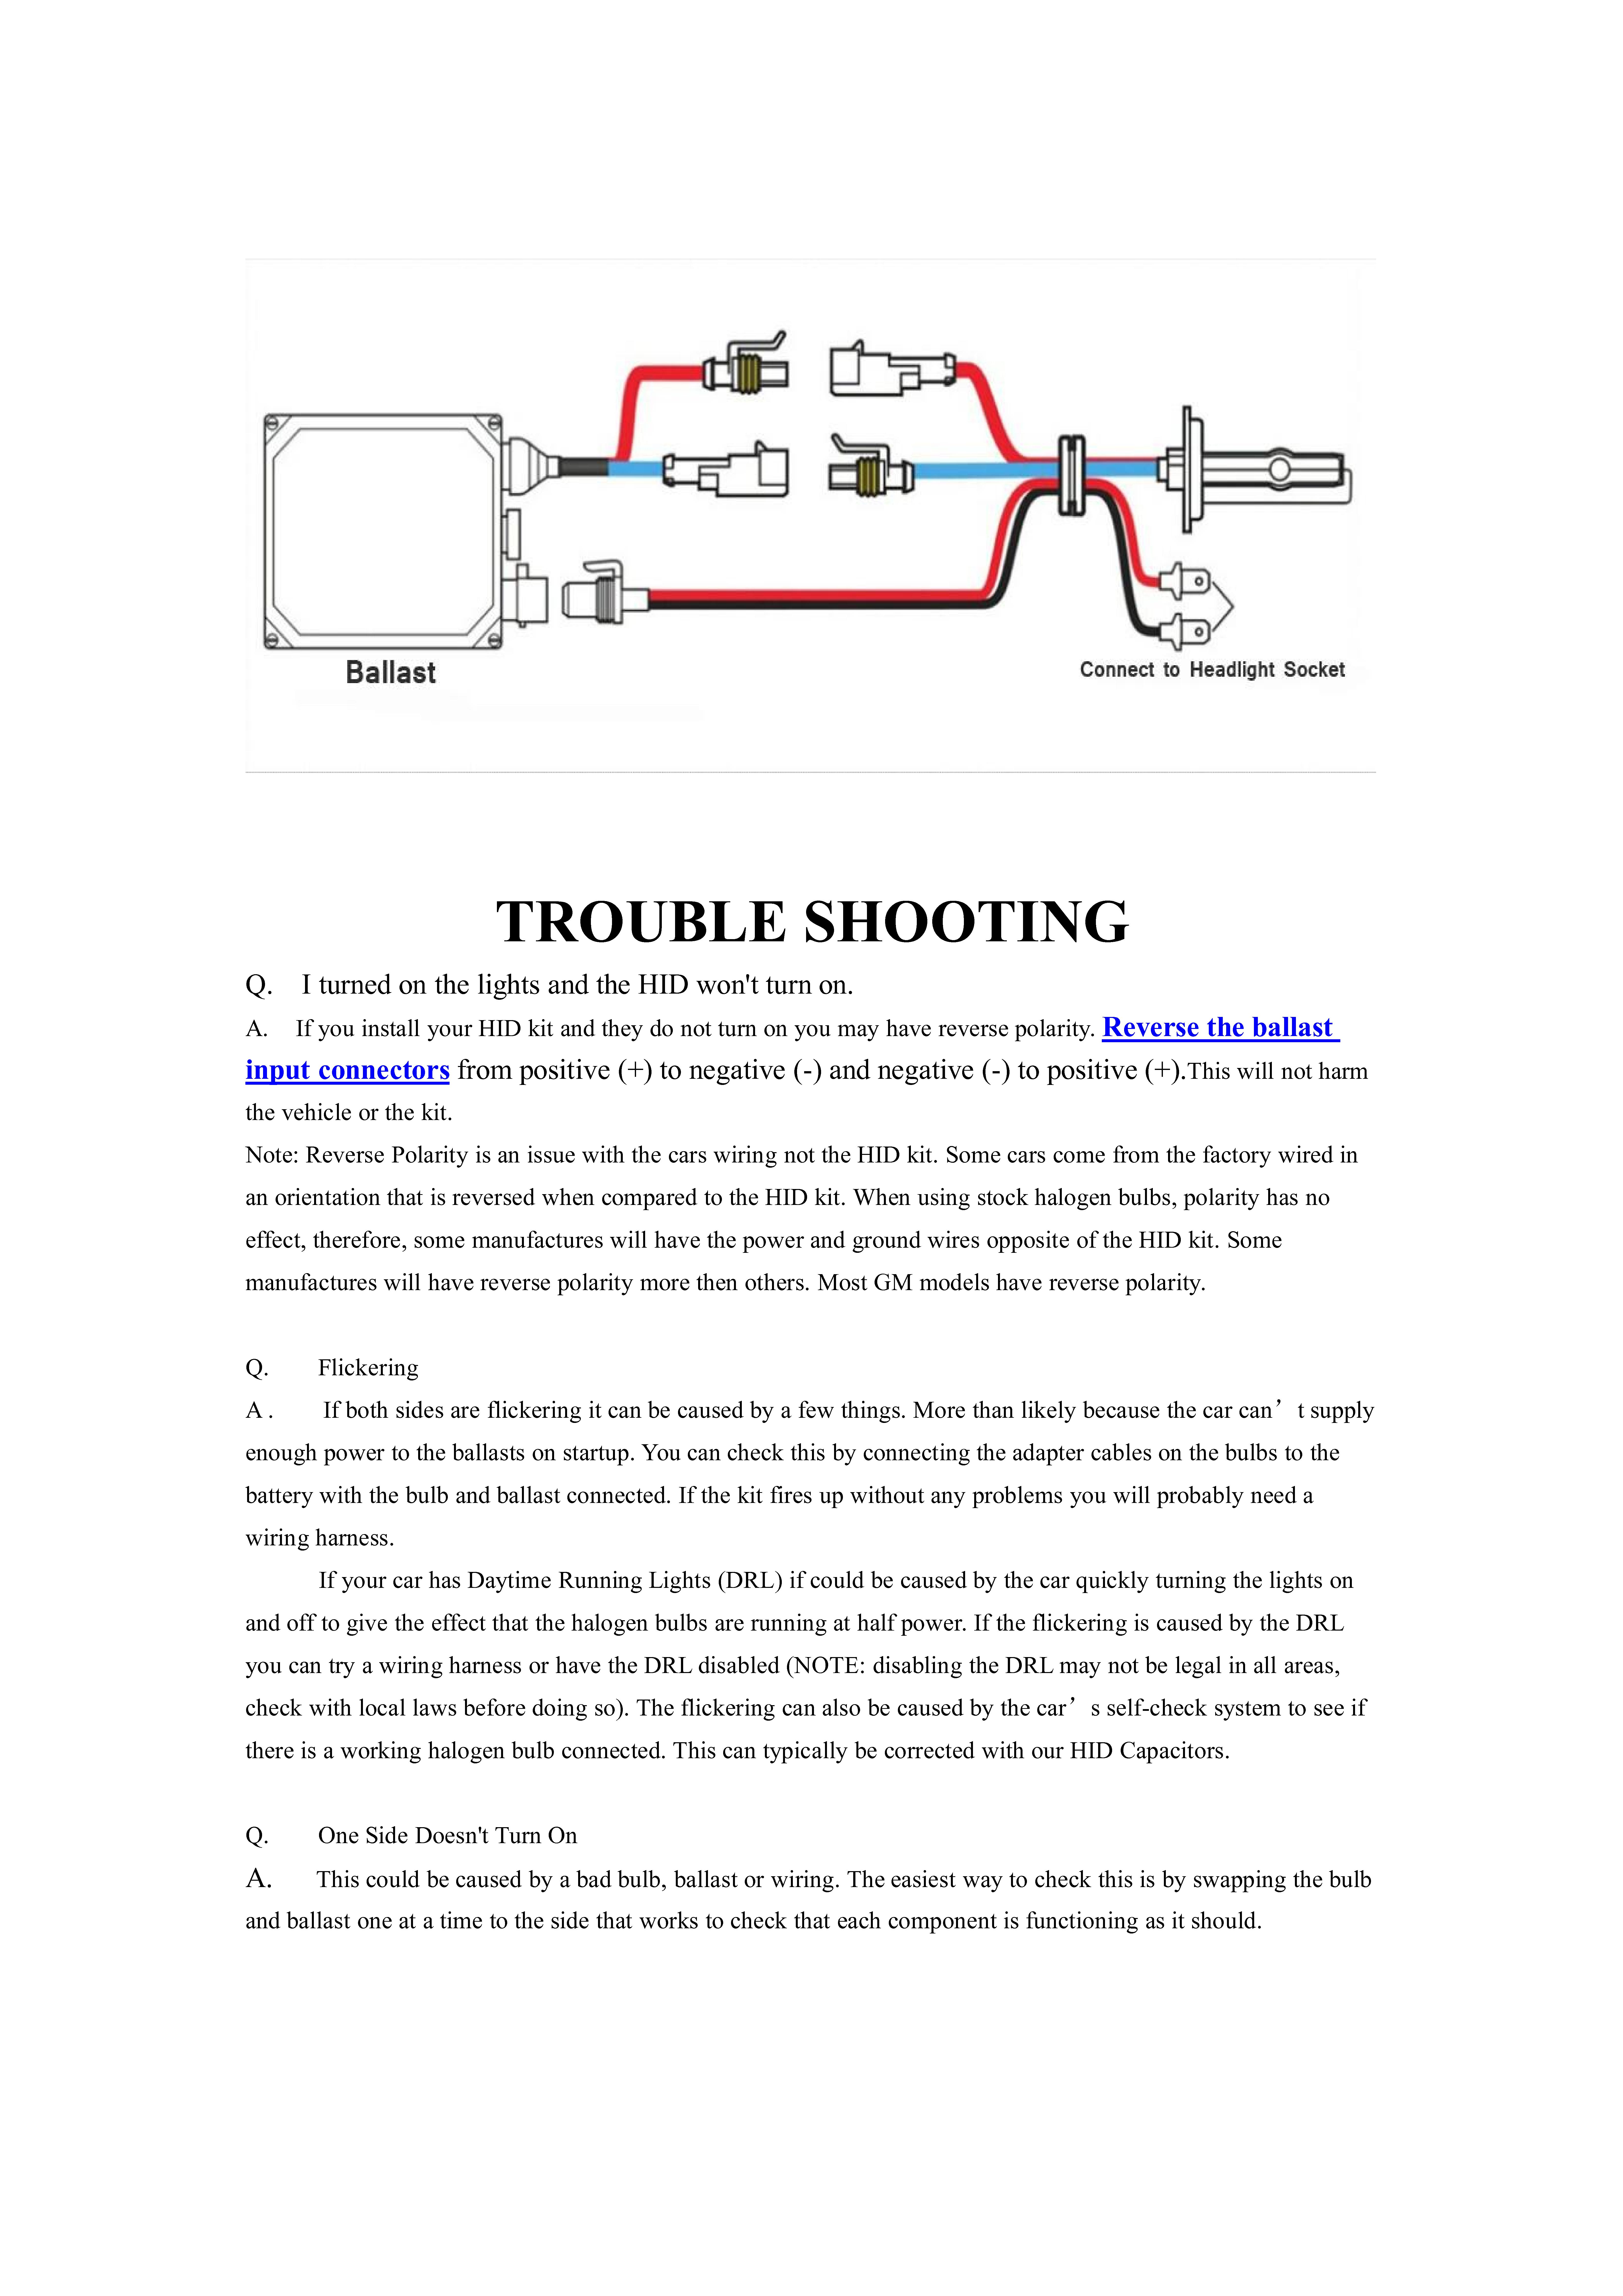 Audi Hid Ballast Wiring Diagram 2002 - Center Wiring Diagram sit-external -  sit-external.iosonointersex.it | Audi Hid Ballast Wiring Diagram 2002 |  | iosonointersex.it